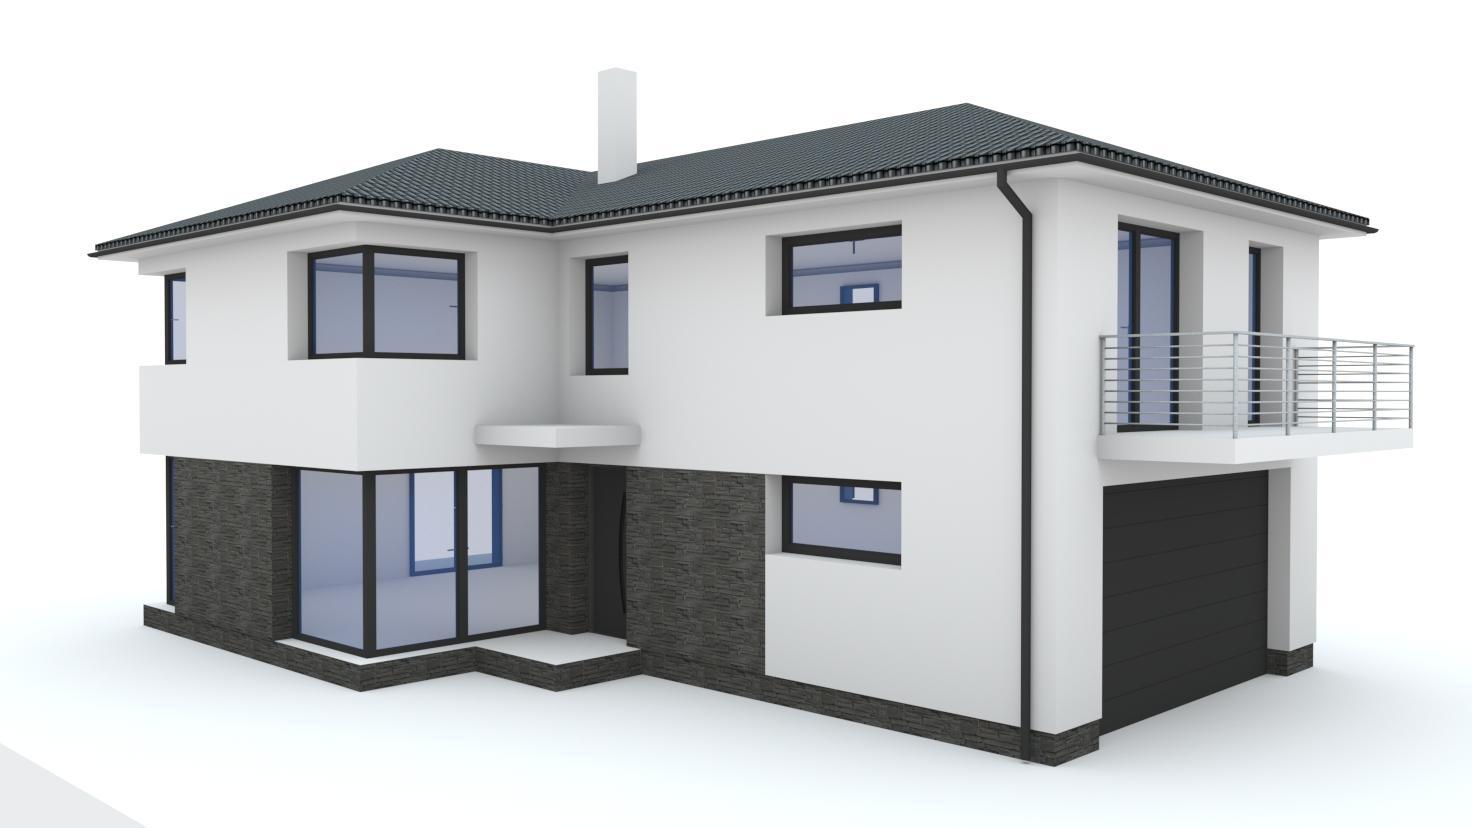 Návrh fasády rodinného domu - Obrázok č. 2